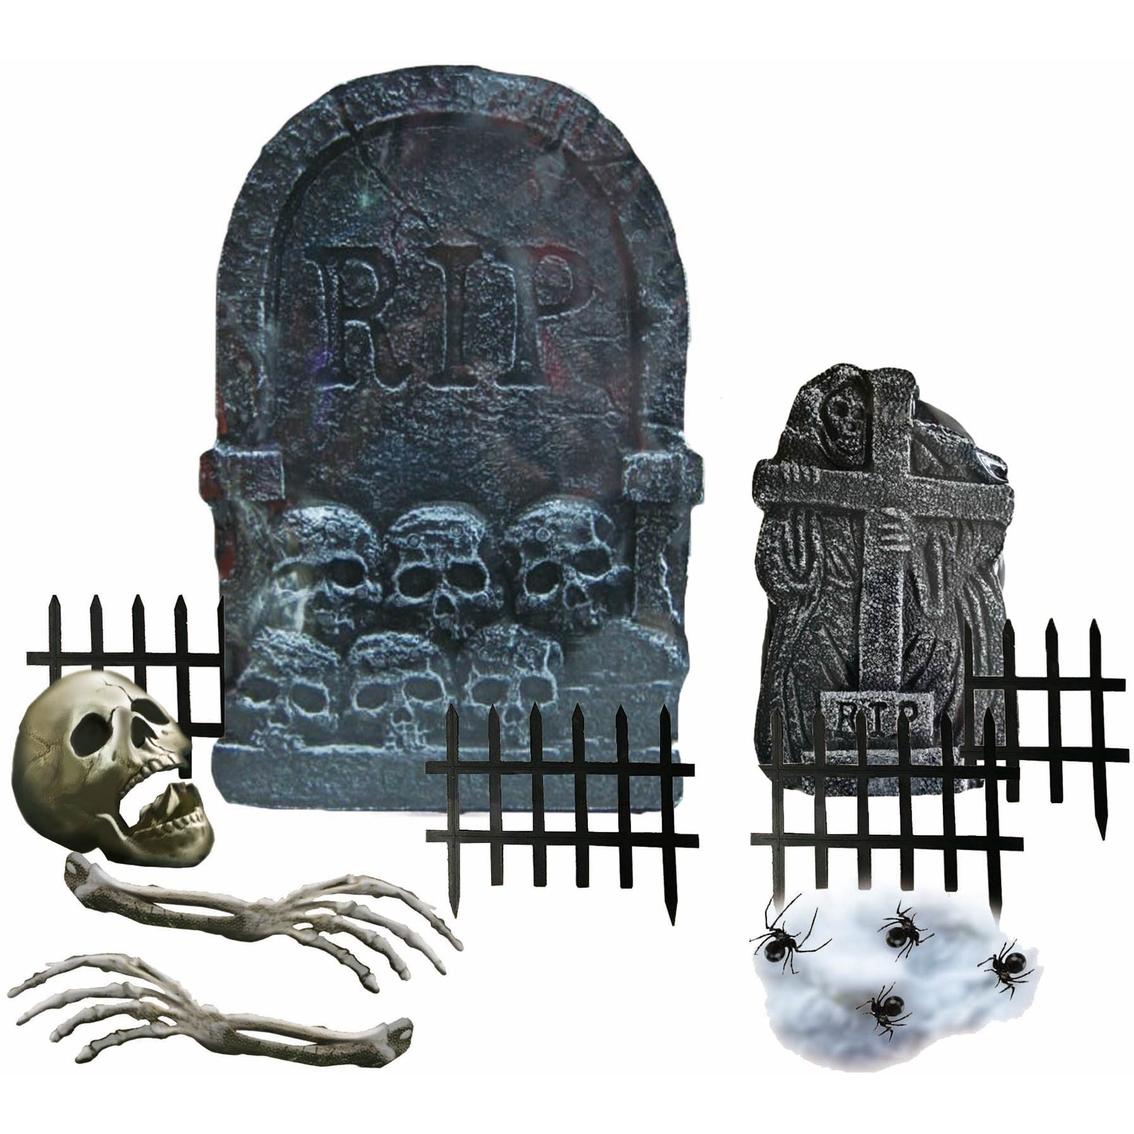 Ice Design Factory Halloween Cemetery Decor 14 Pc Kit